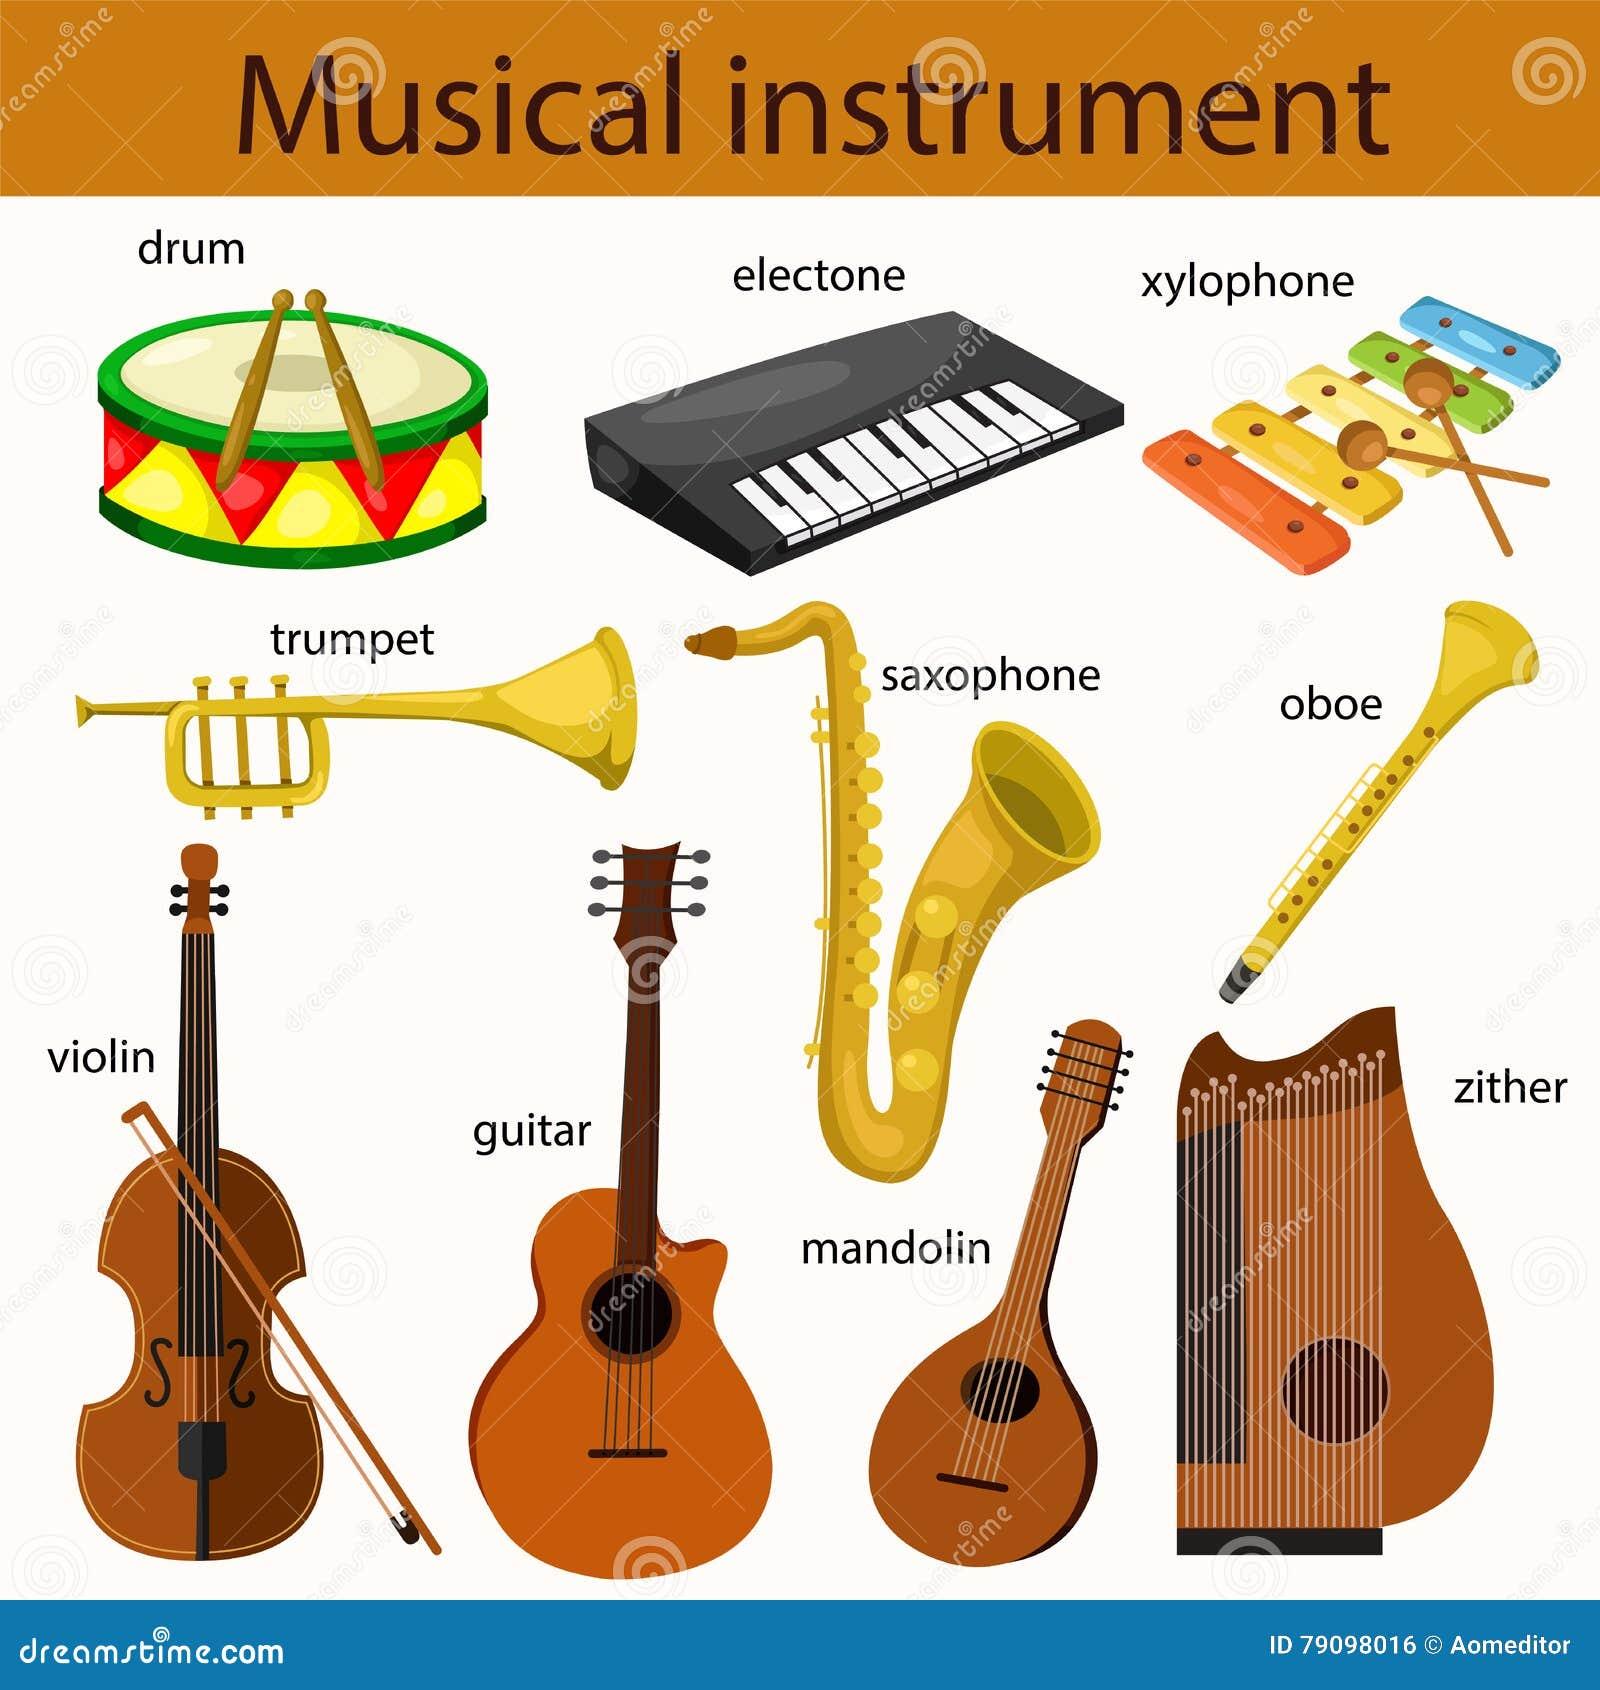 Illustrator van muzikaal instrument